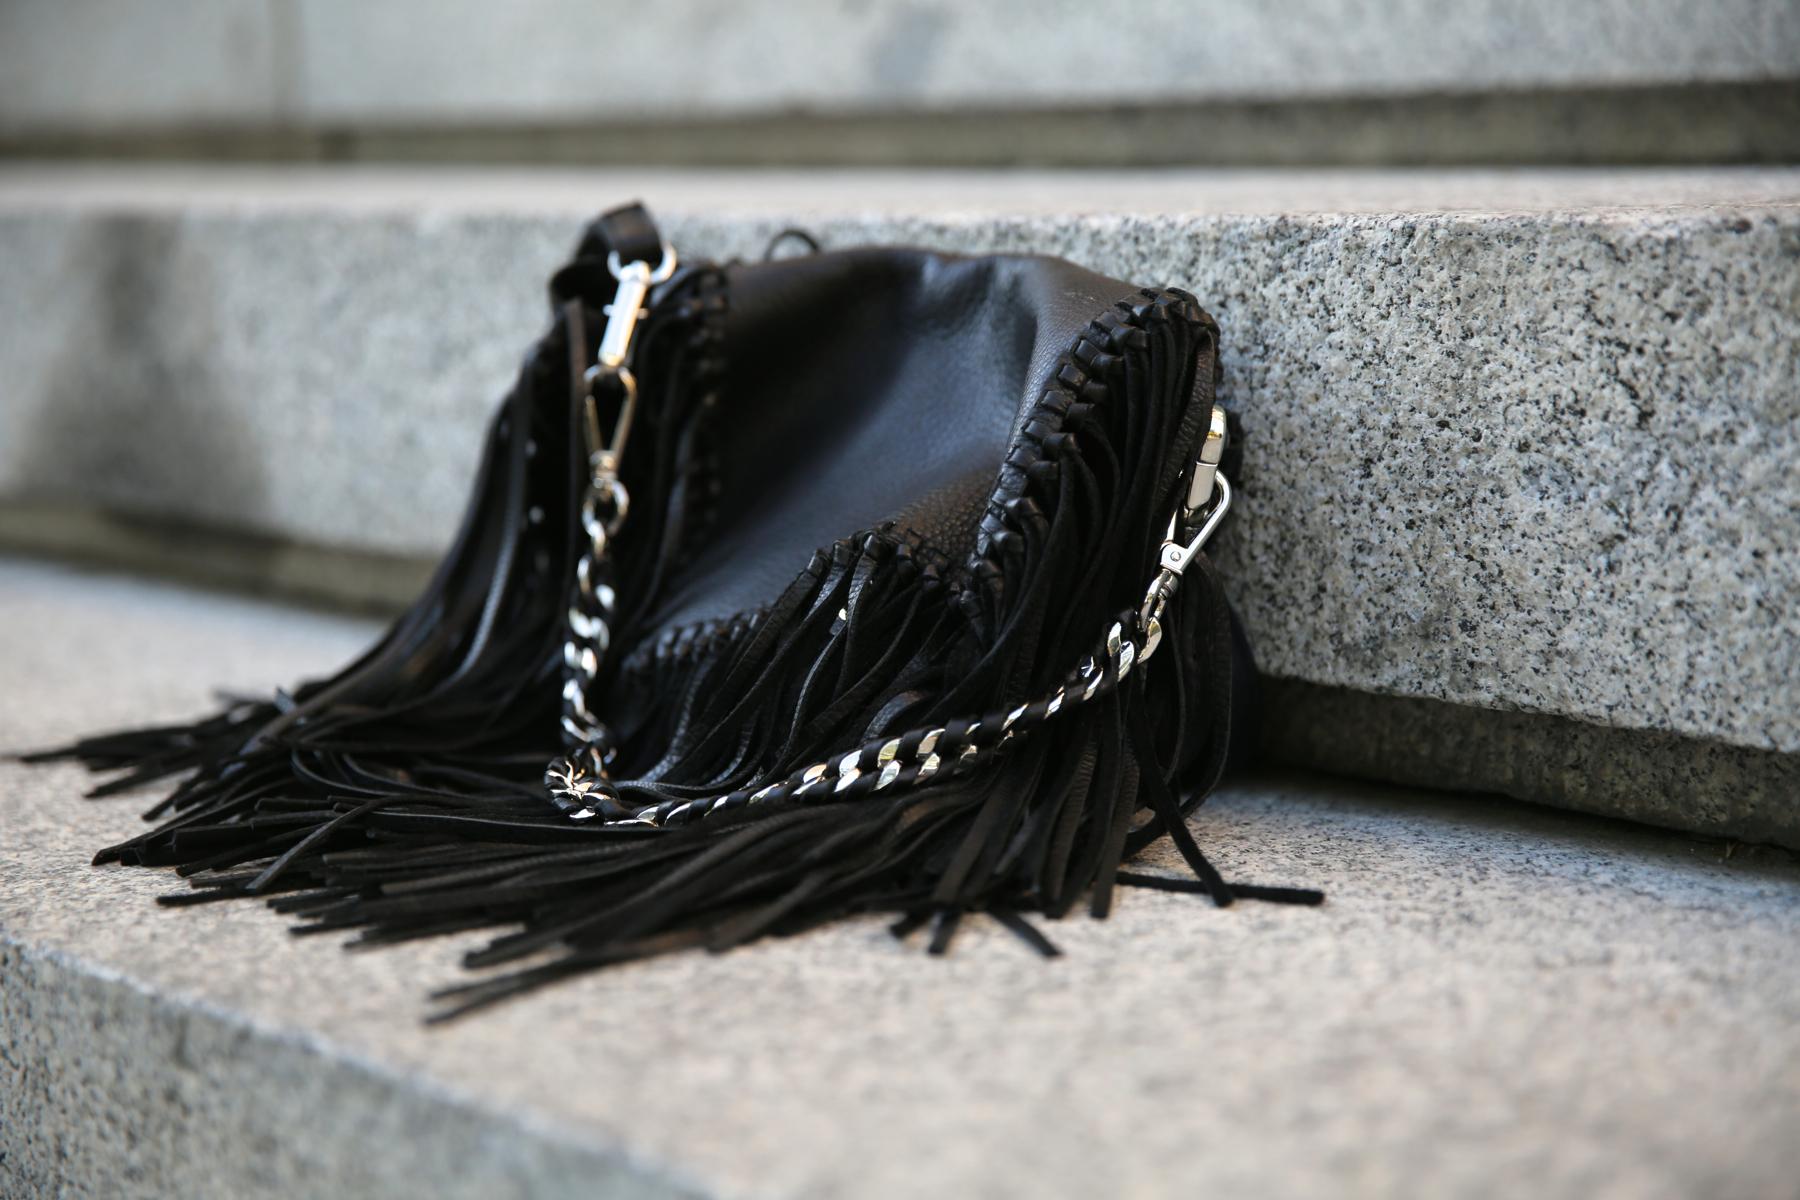 trendy_taste-look-outfit-street_style-ootd-blog-blogger-fashion_spain-moda_españa-animal_print-boho-casual-falda-skirt-black_booties-botines_negros-jeffrey_campbell-zara-bolso_flecos-vintage-4